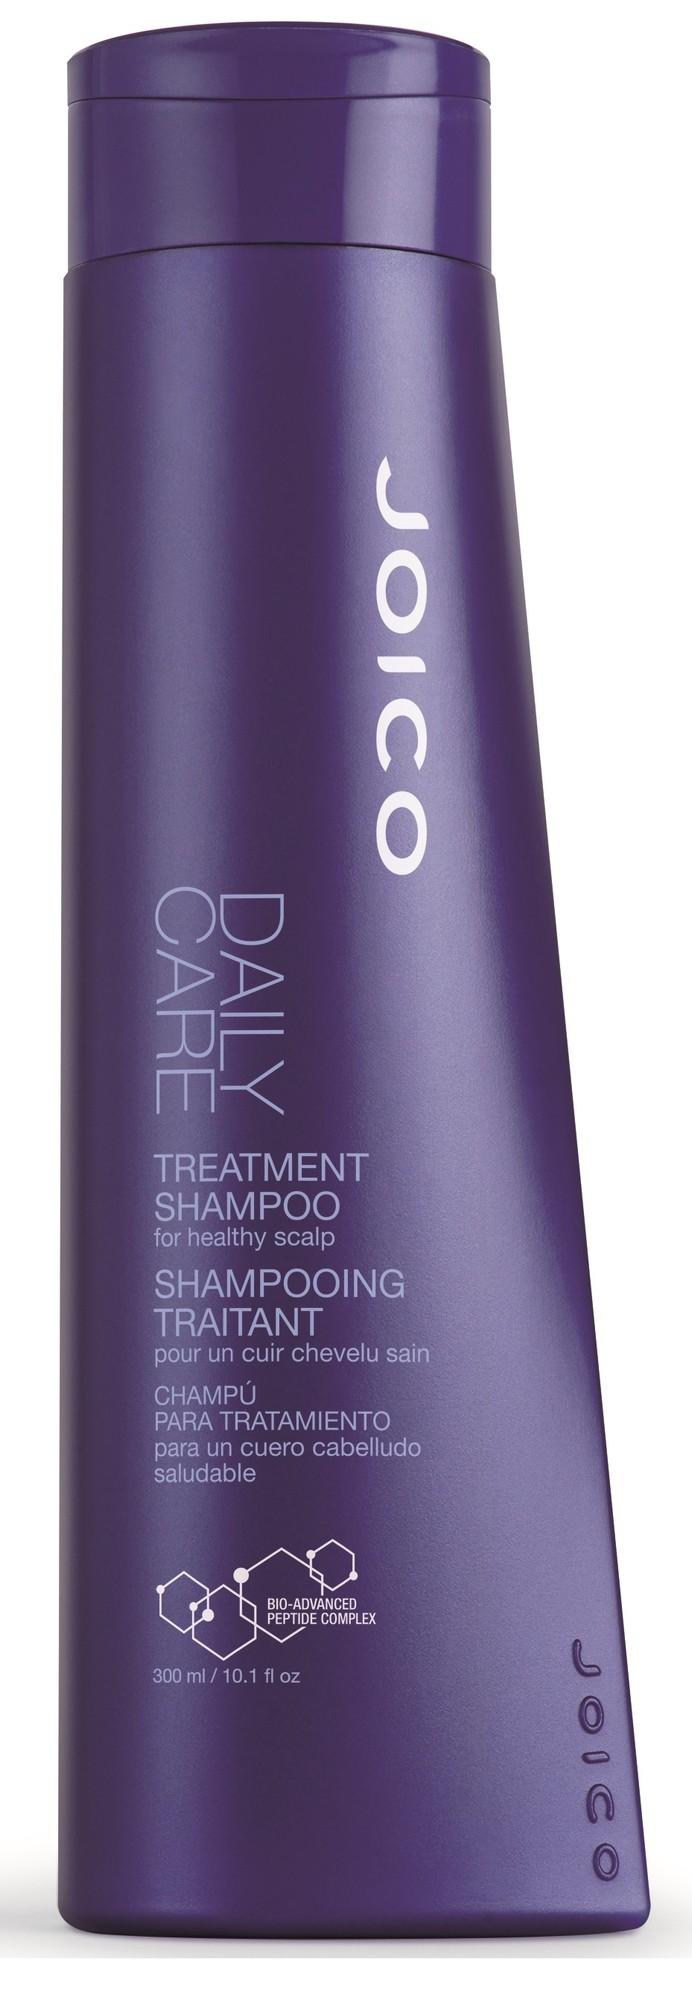 Daily Care Treatment Shampoo 300 ml